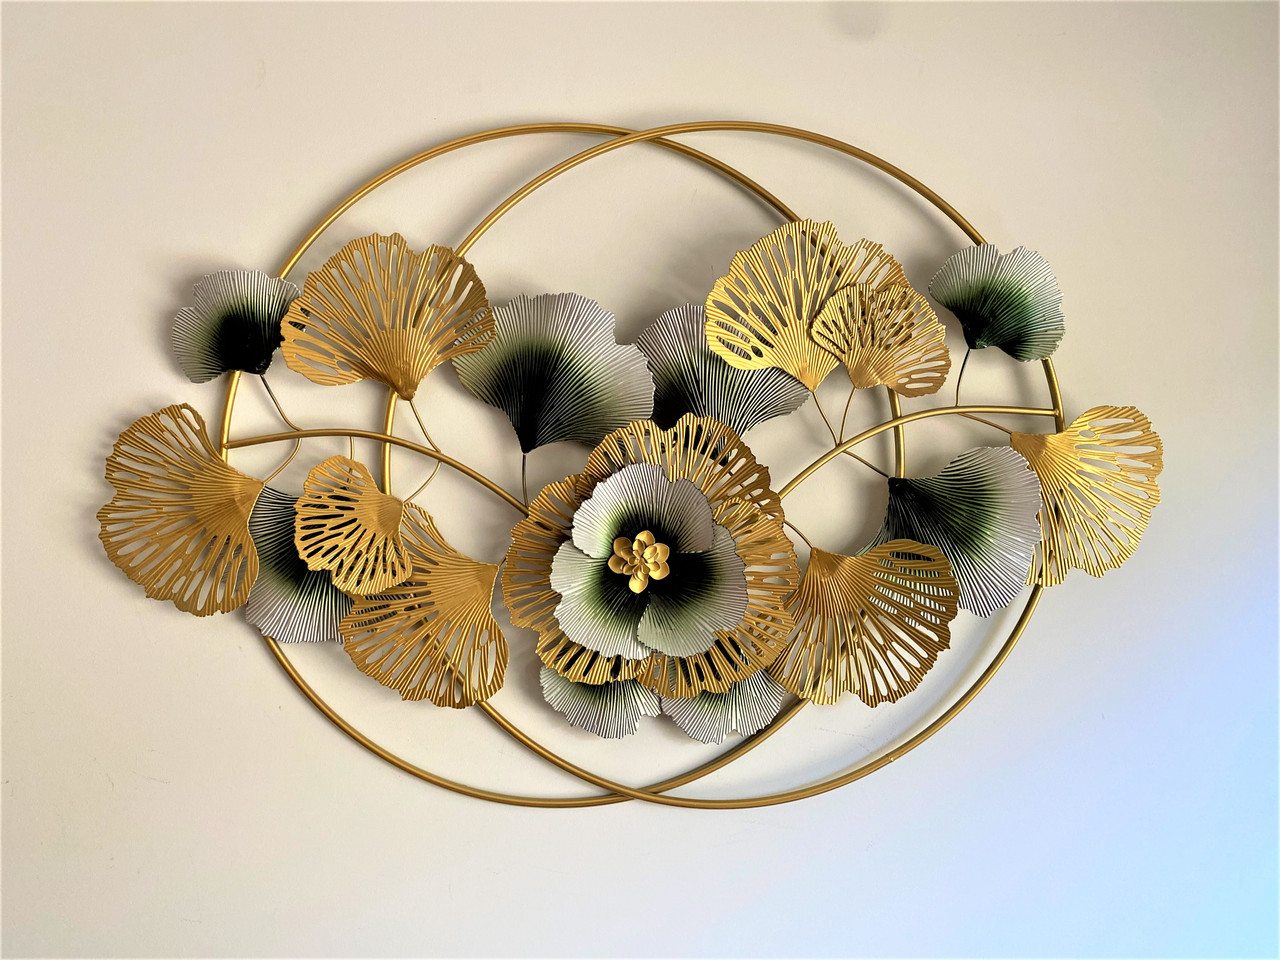 METAL WALL ART - GOLD GREEN FLOWERS W RINGS- MEDIUM (116cm)